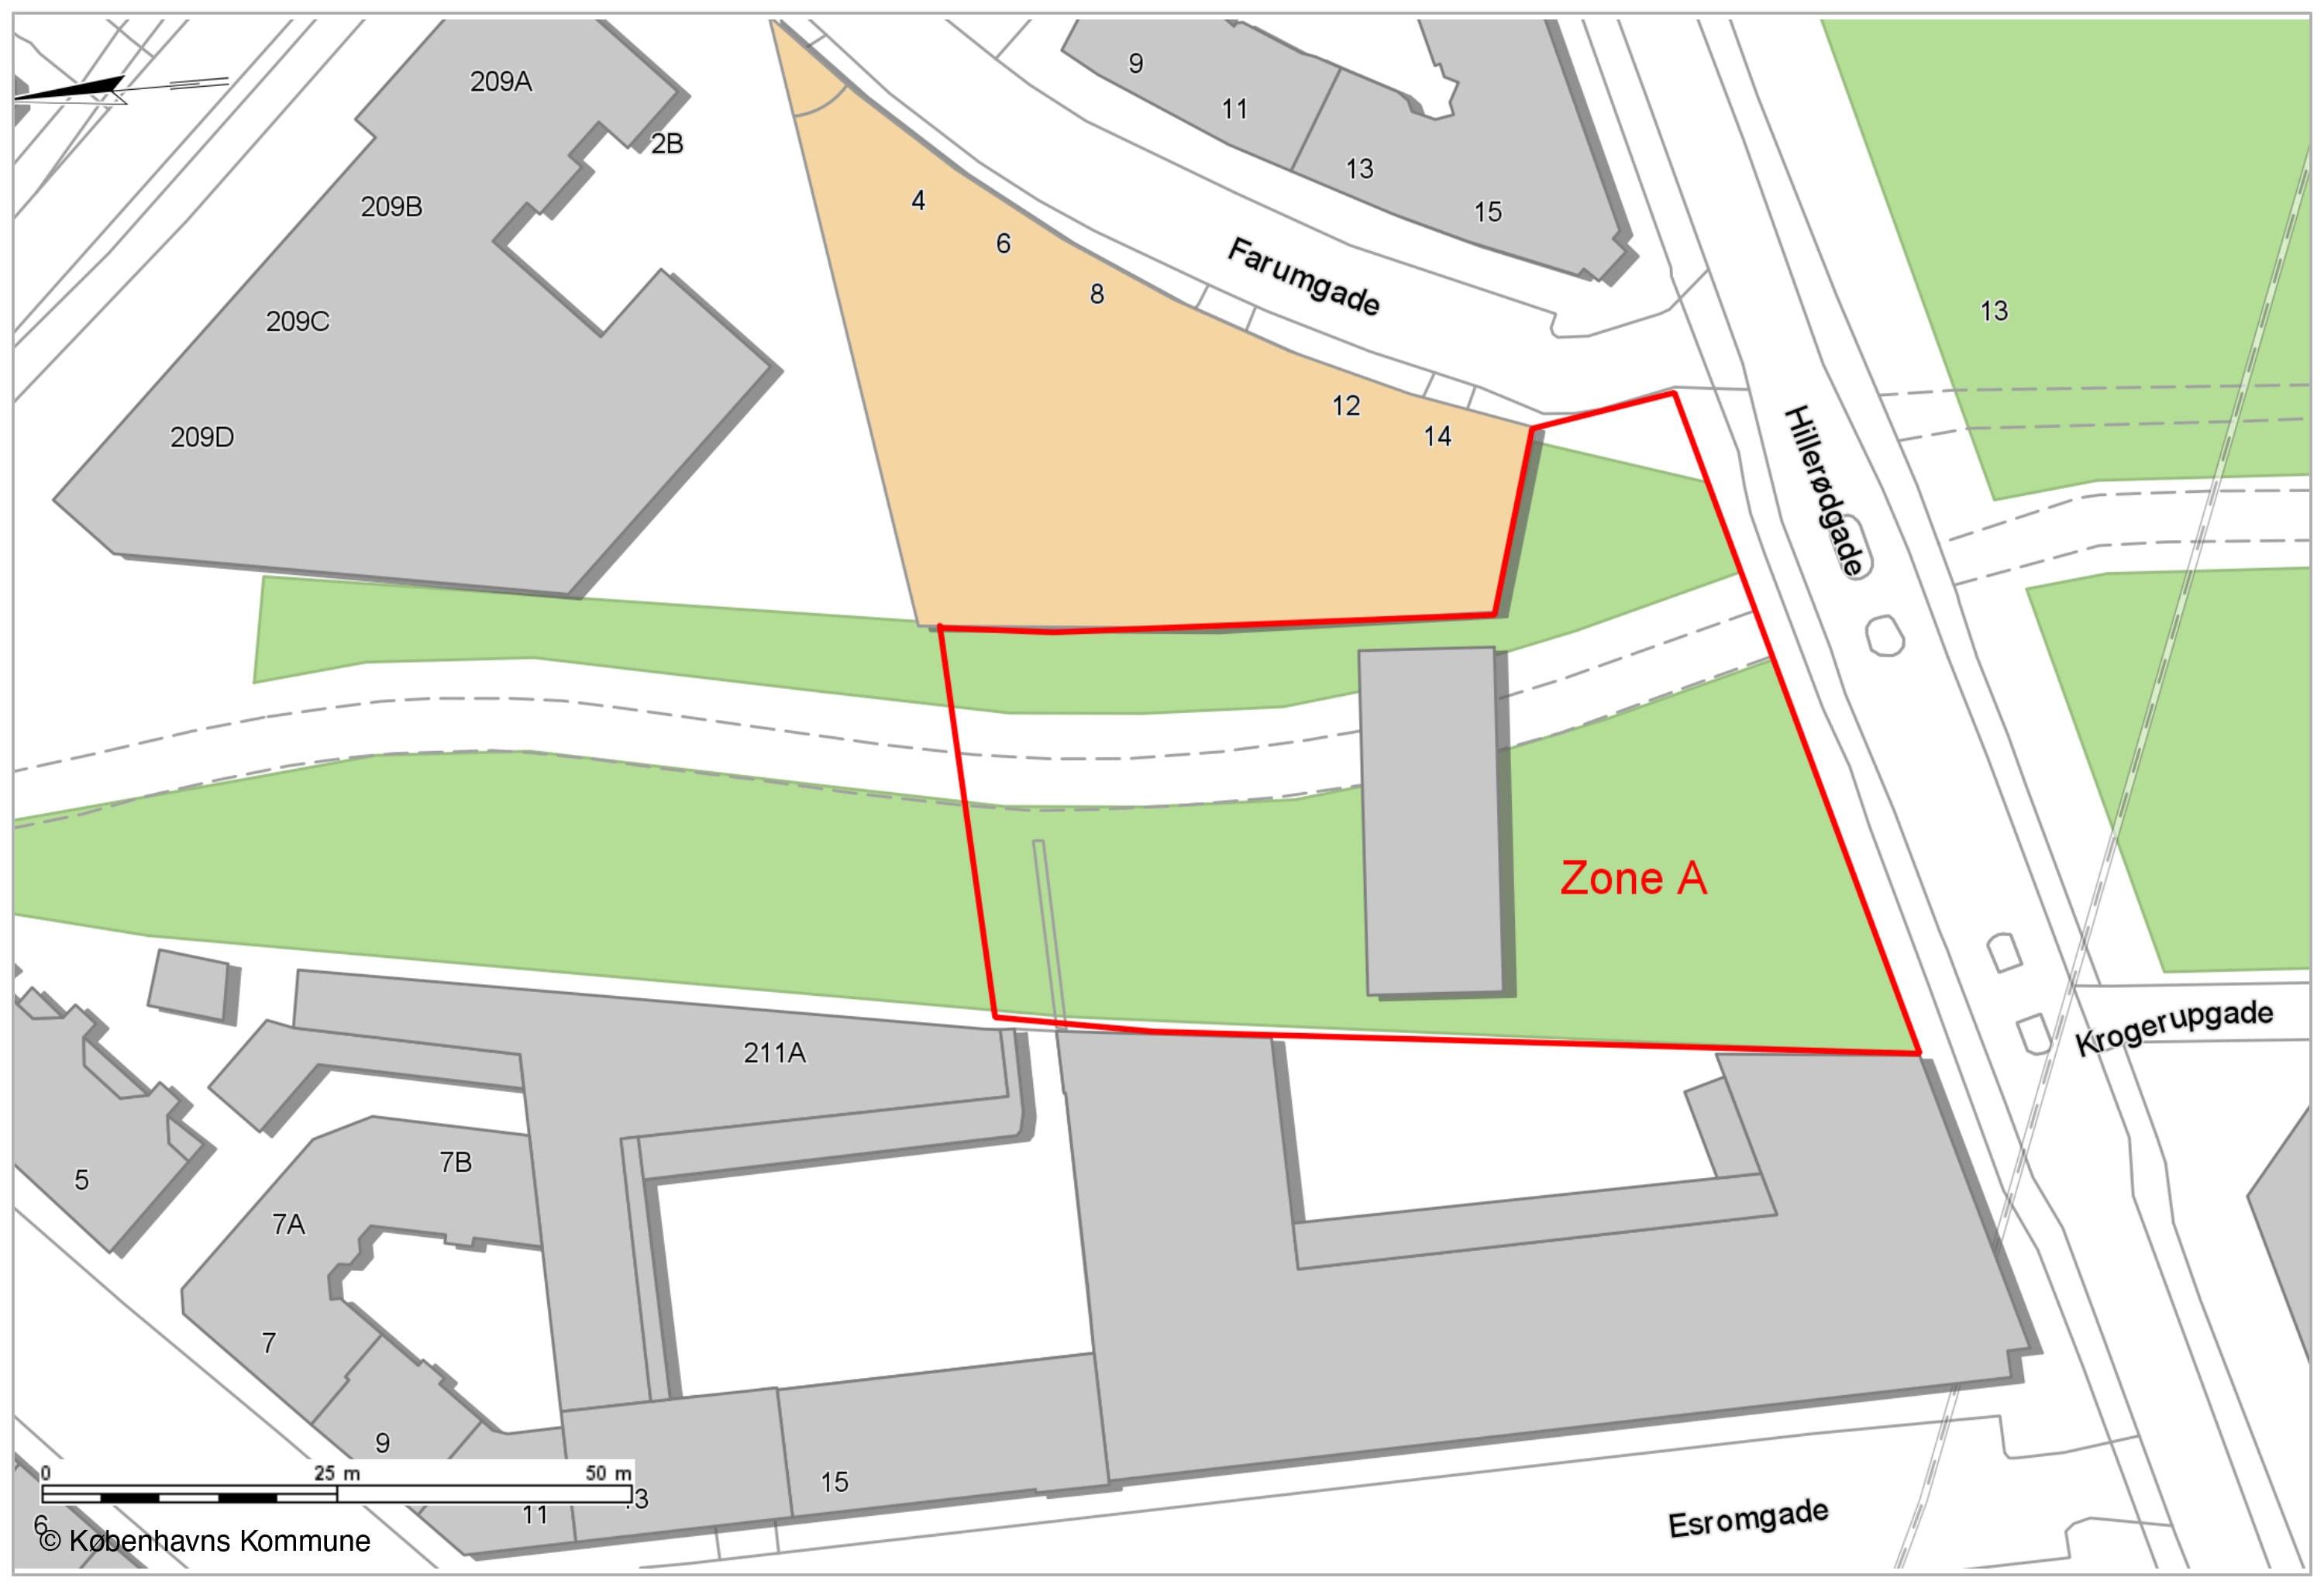 Opholdsforbud Nørrebro Skatepark zone A